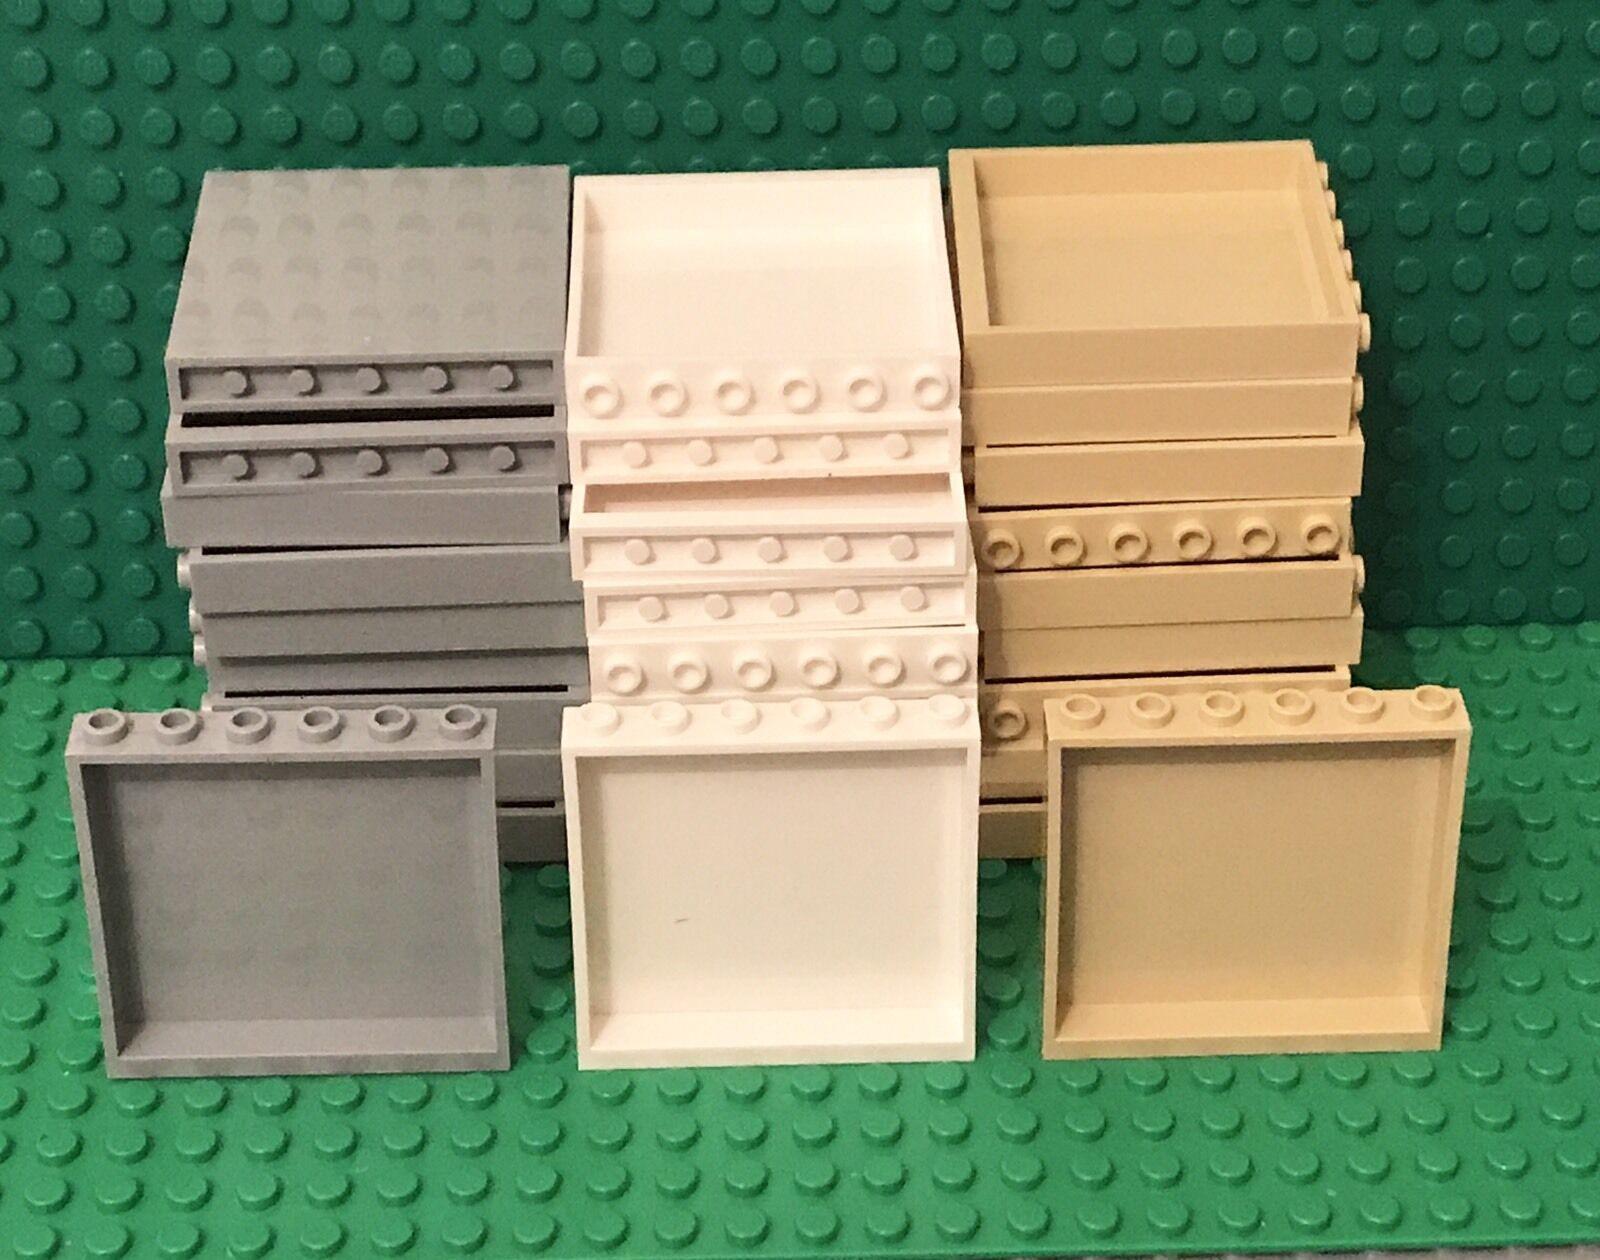 Lego 50 Tan 1x6x5 Panel Bulk Parts Lot